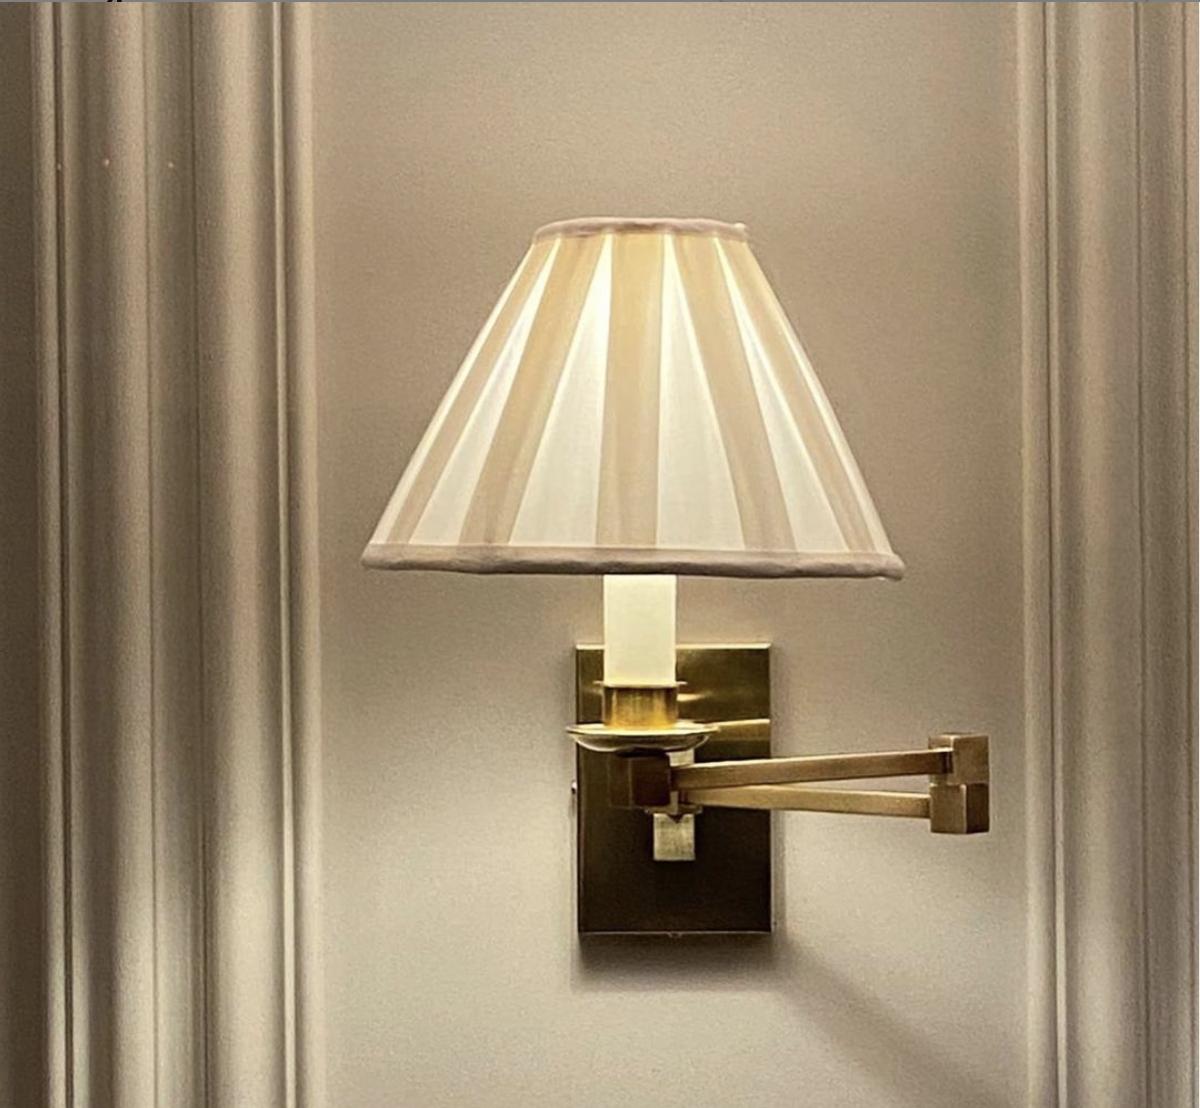 Aveoca-london-traditonal-lighting